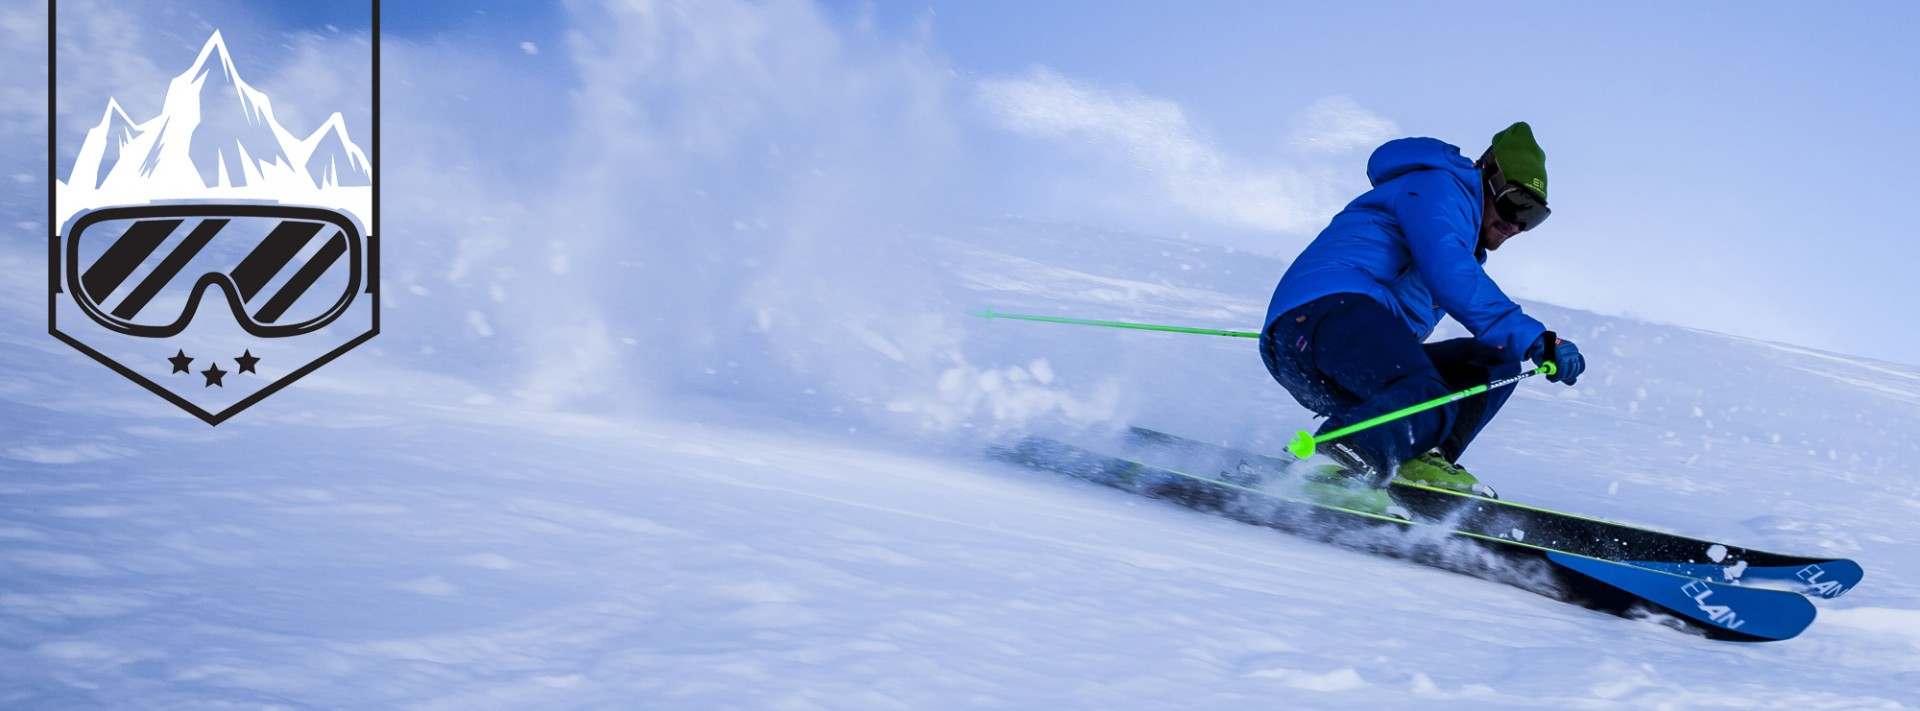 Chamrousse Ski derby